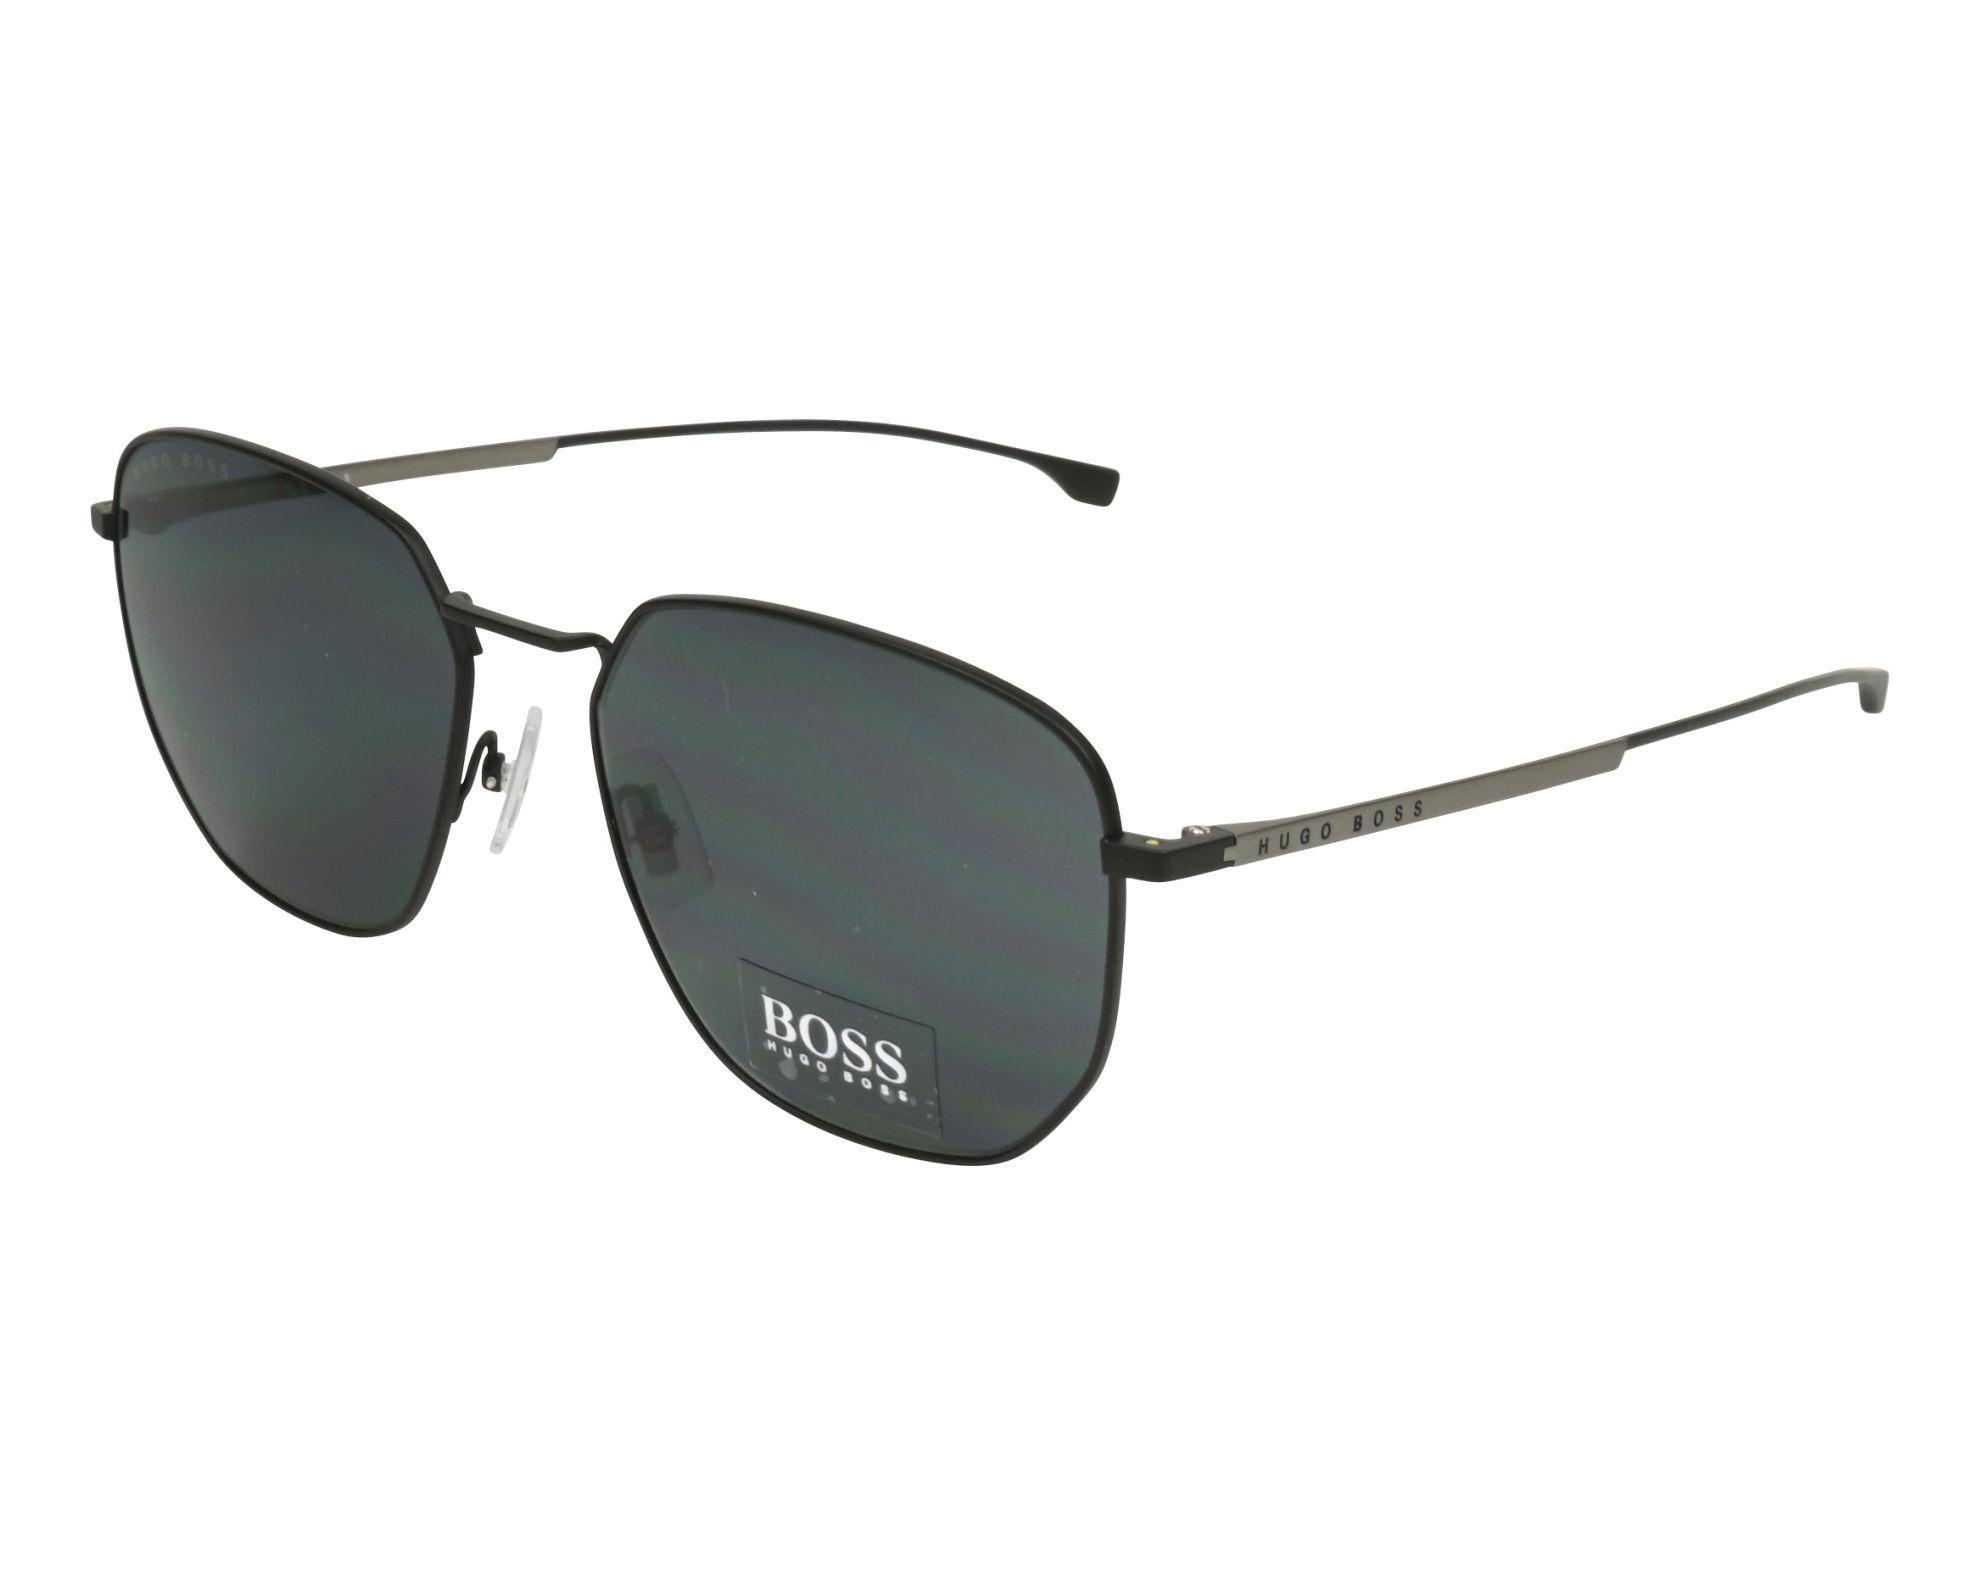 ee342b6882 Sunglasses Hugo Boss BOSS-0992-F-S 003 IR 58-18 Black Silver